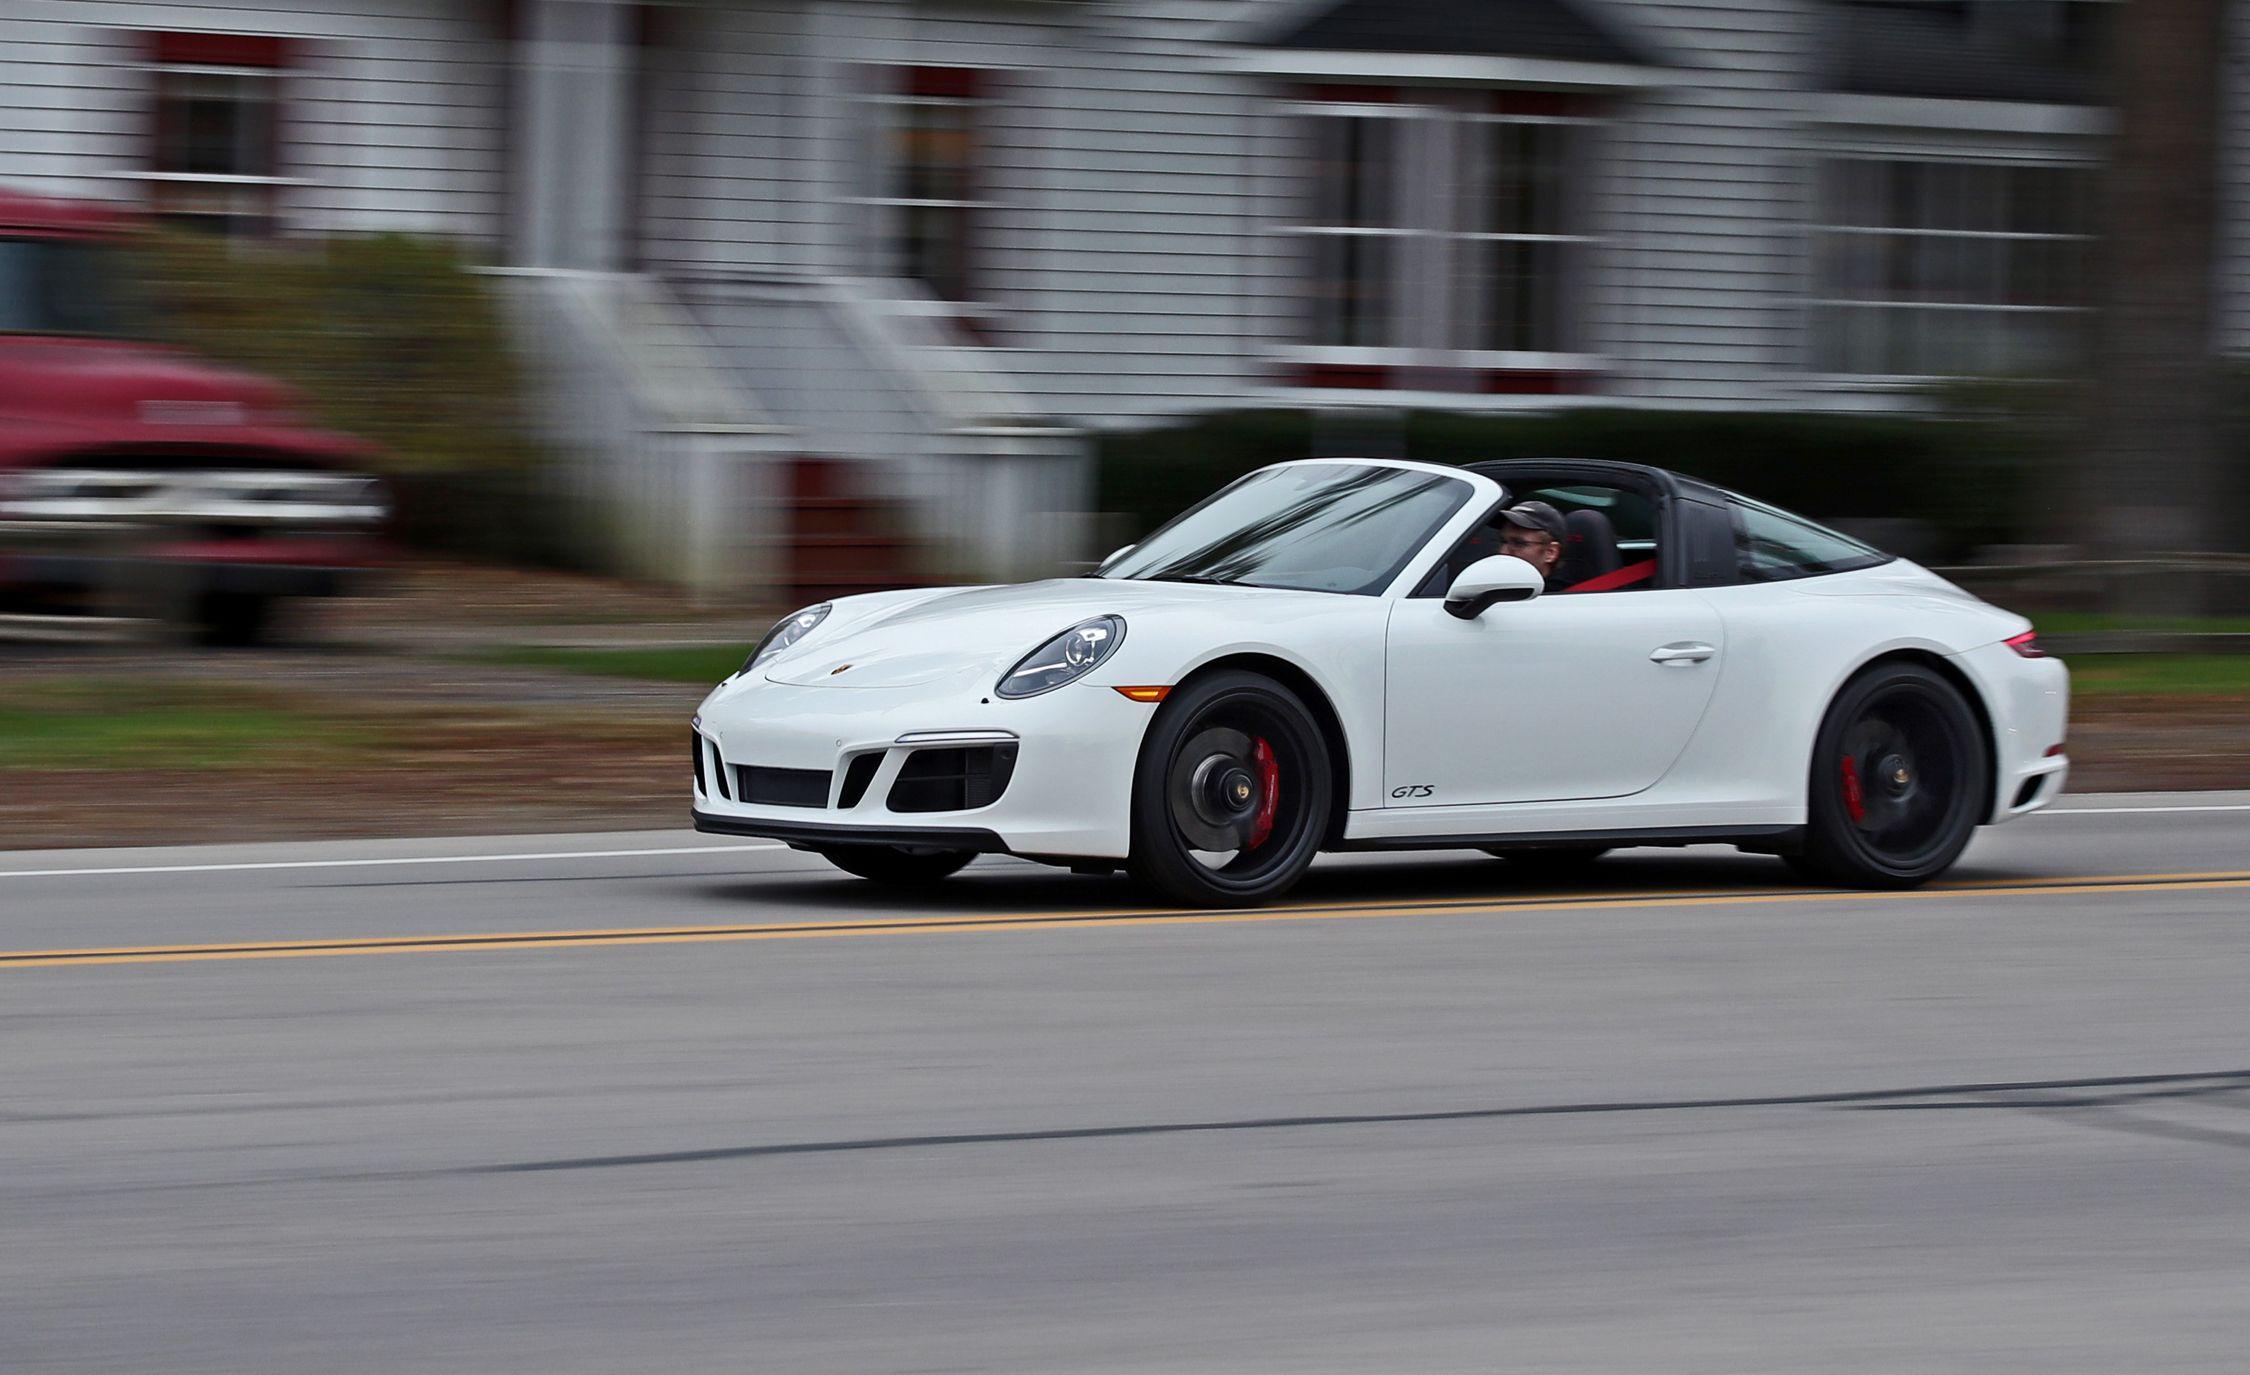 2017 Porsche 911 Targa 4 Gts Pdk Automatic Test Review Car And Driver